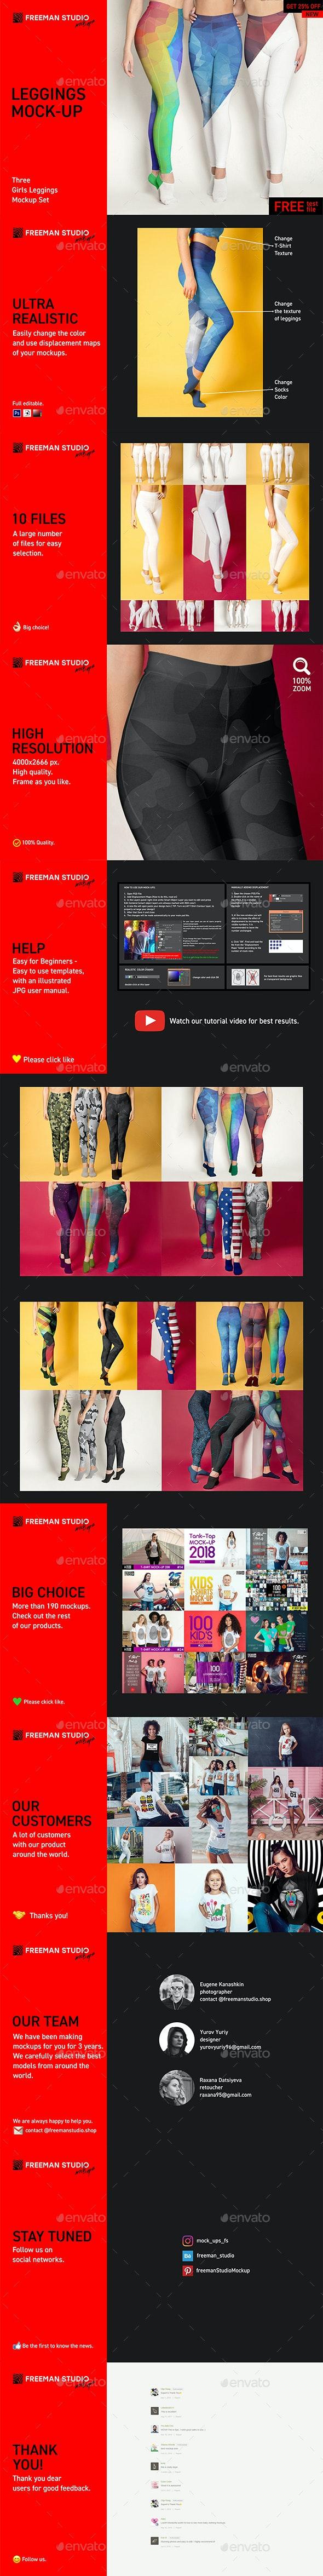 Three Girls Leggings Mock-Up Set - Product Mock-Ups Graphics